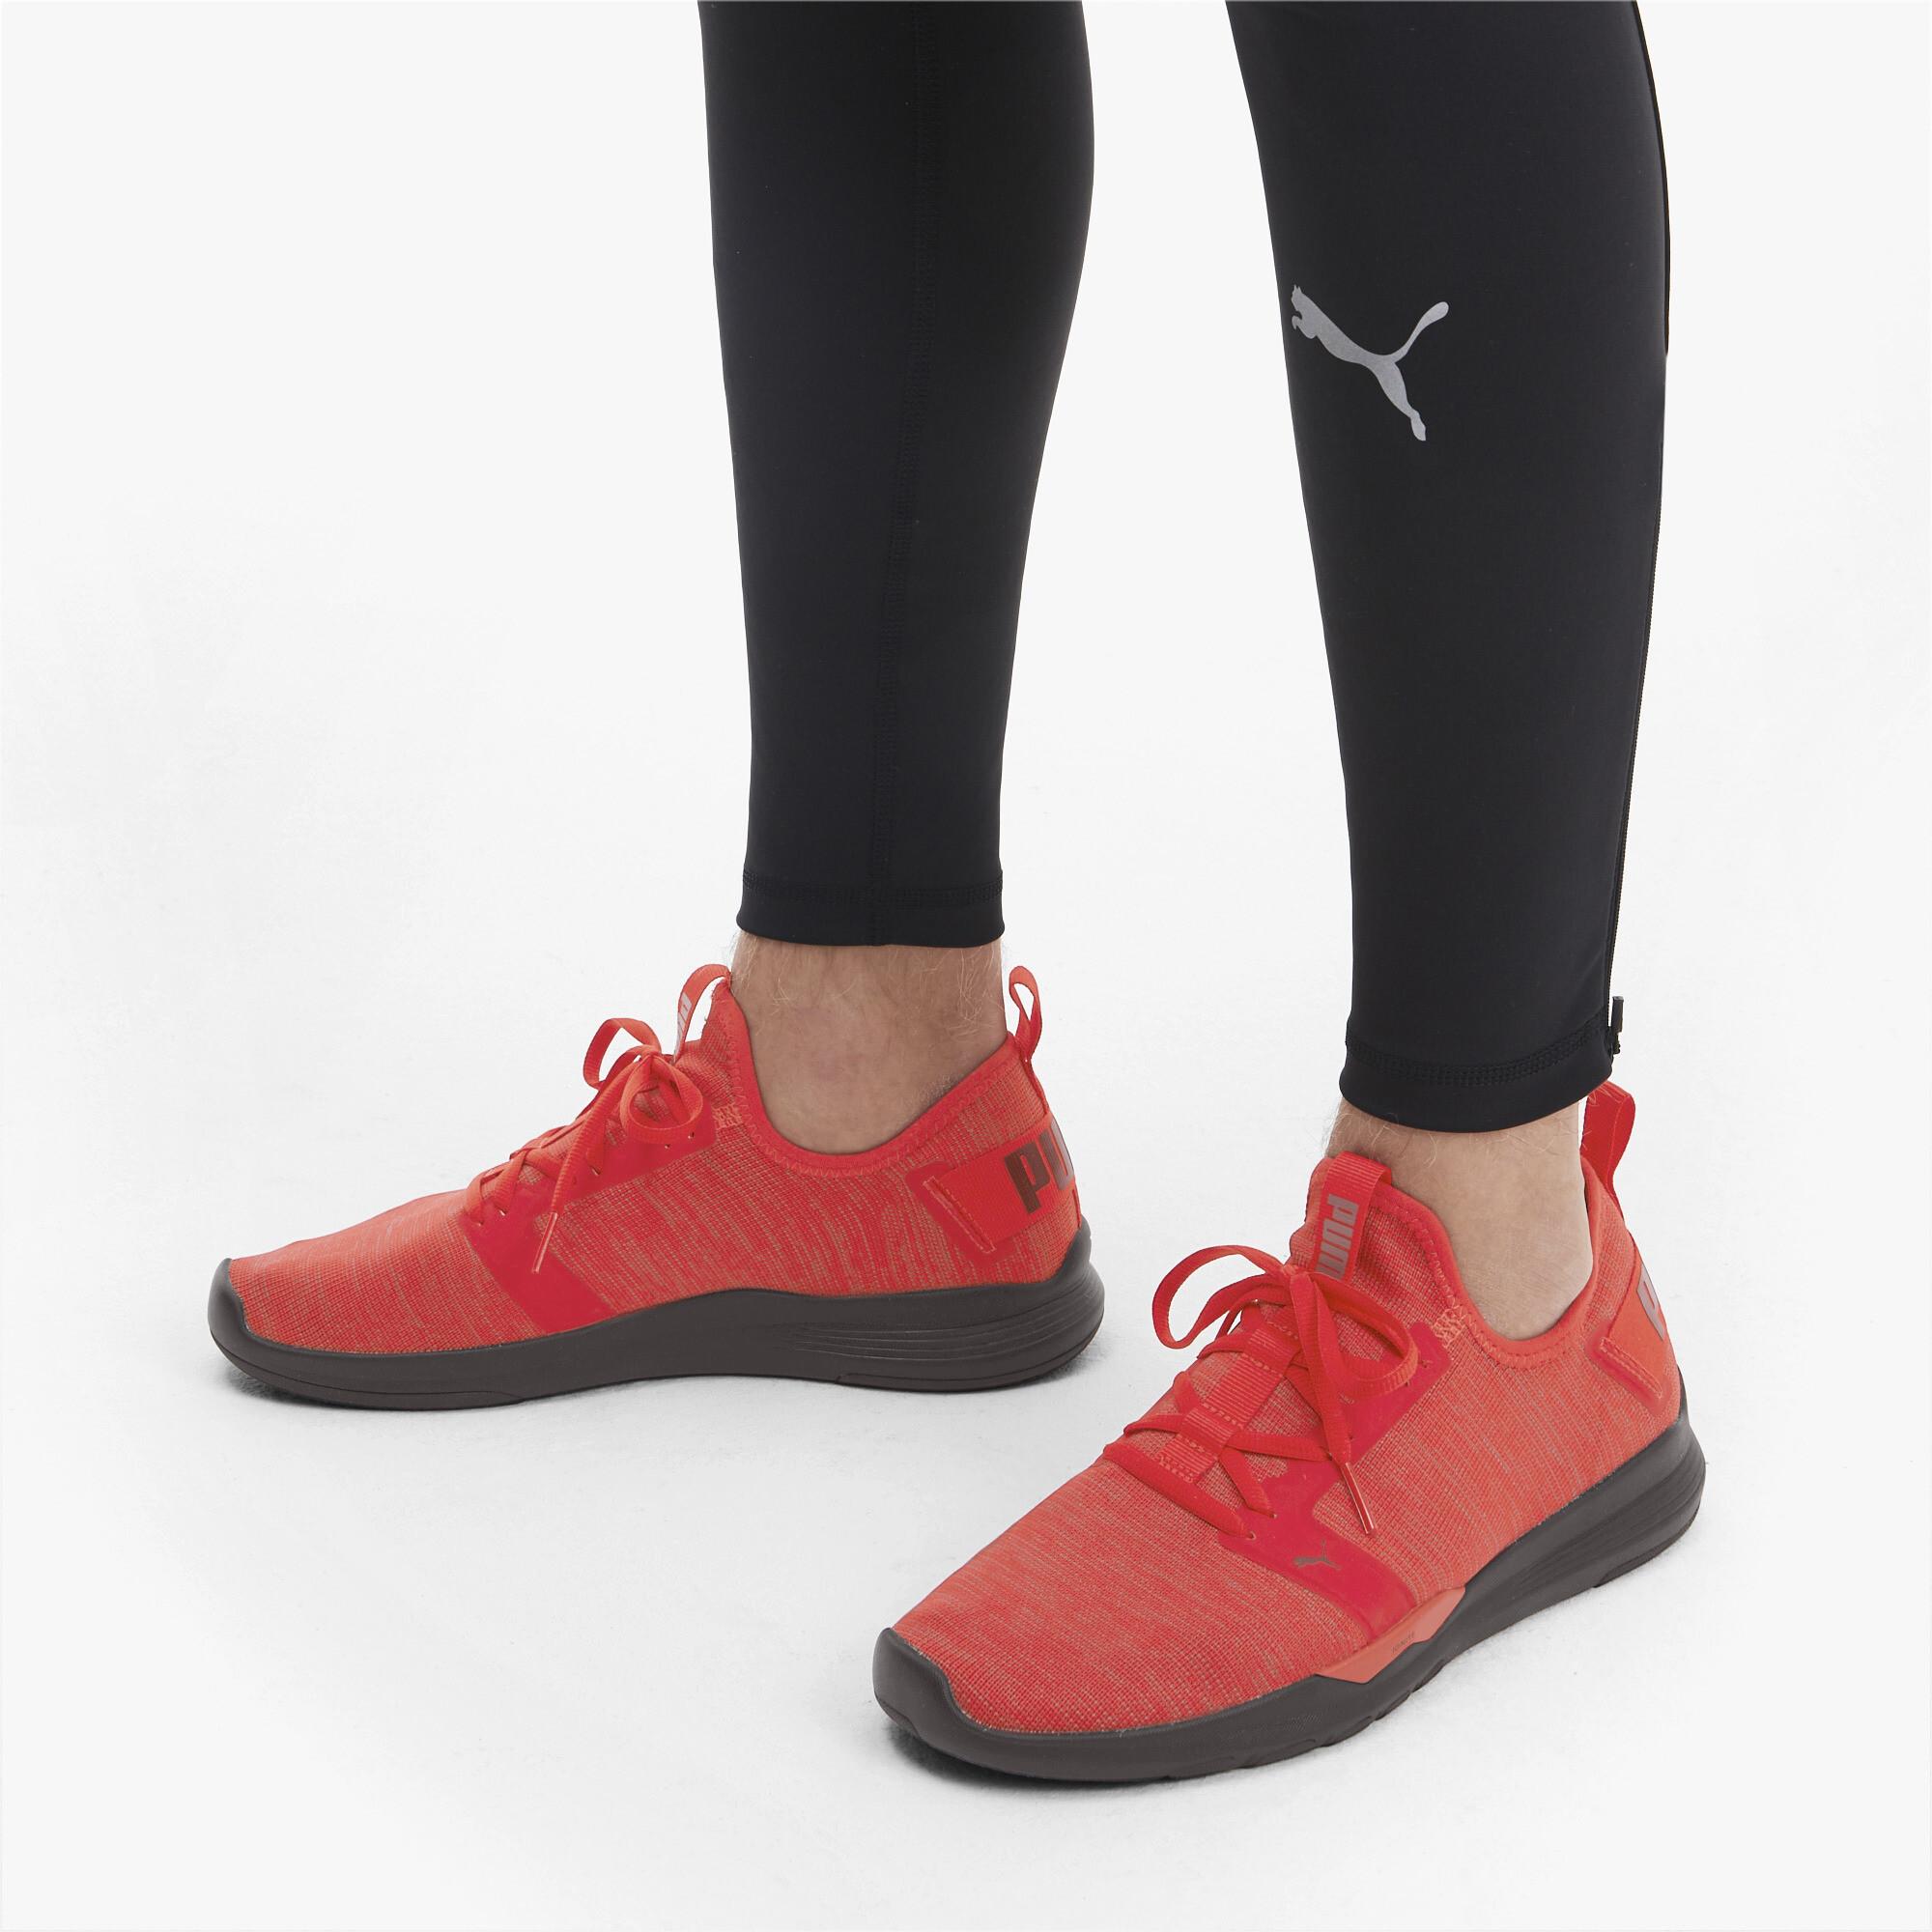 PUMA-Men-039-s-IGNITE-Contender-Knit-Running-Shoes thumbnail 17